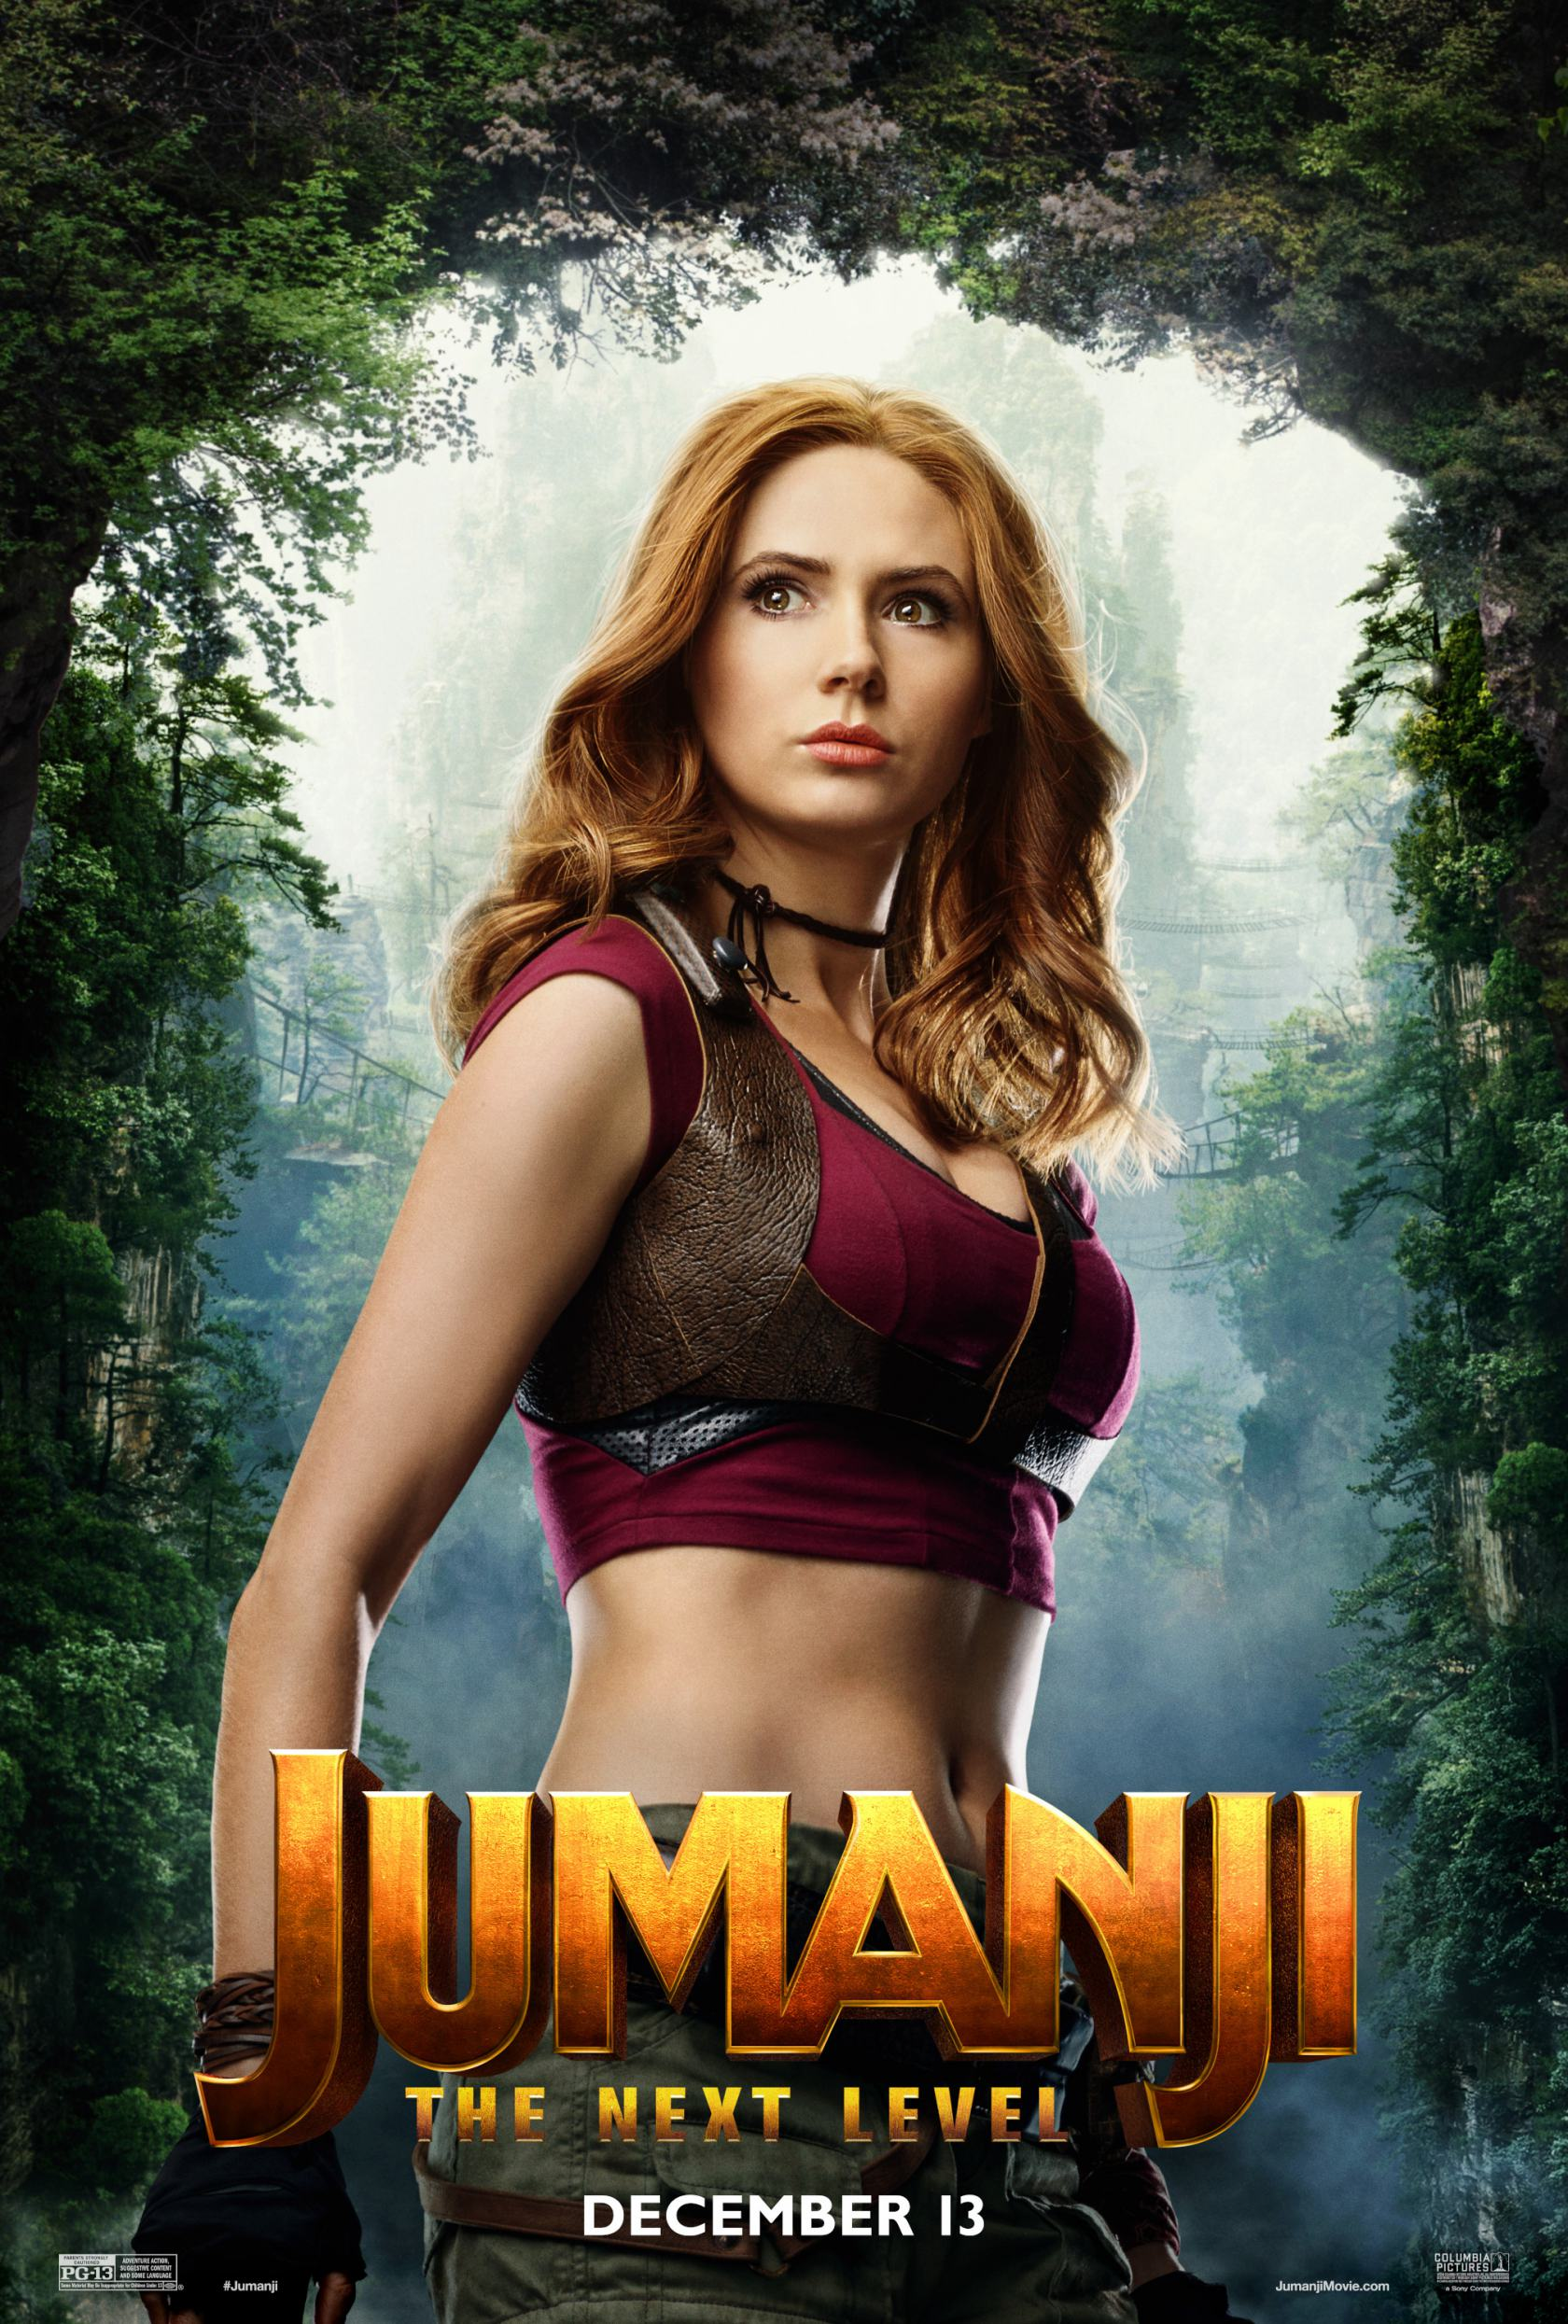 Jumanji: The Next Level Poster #2